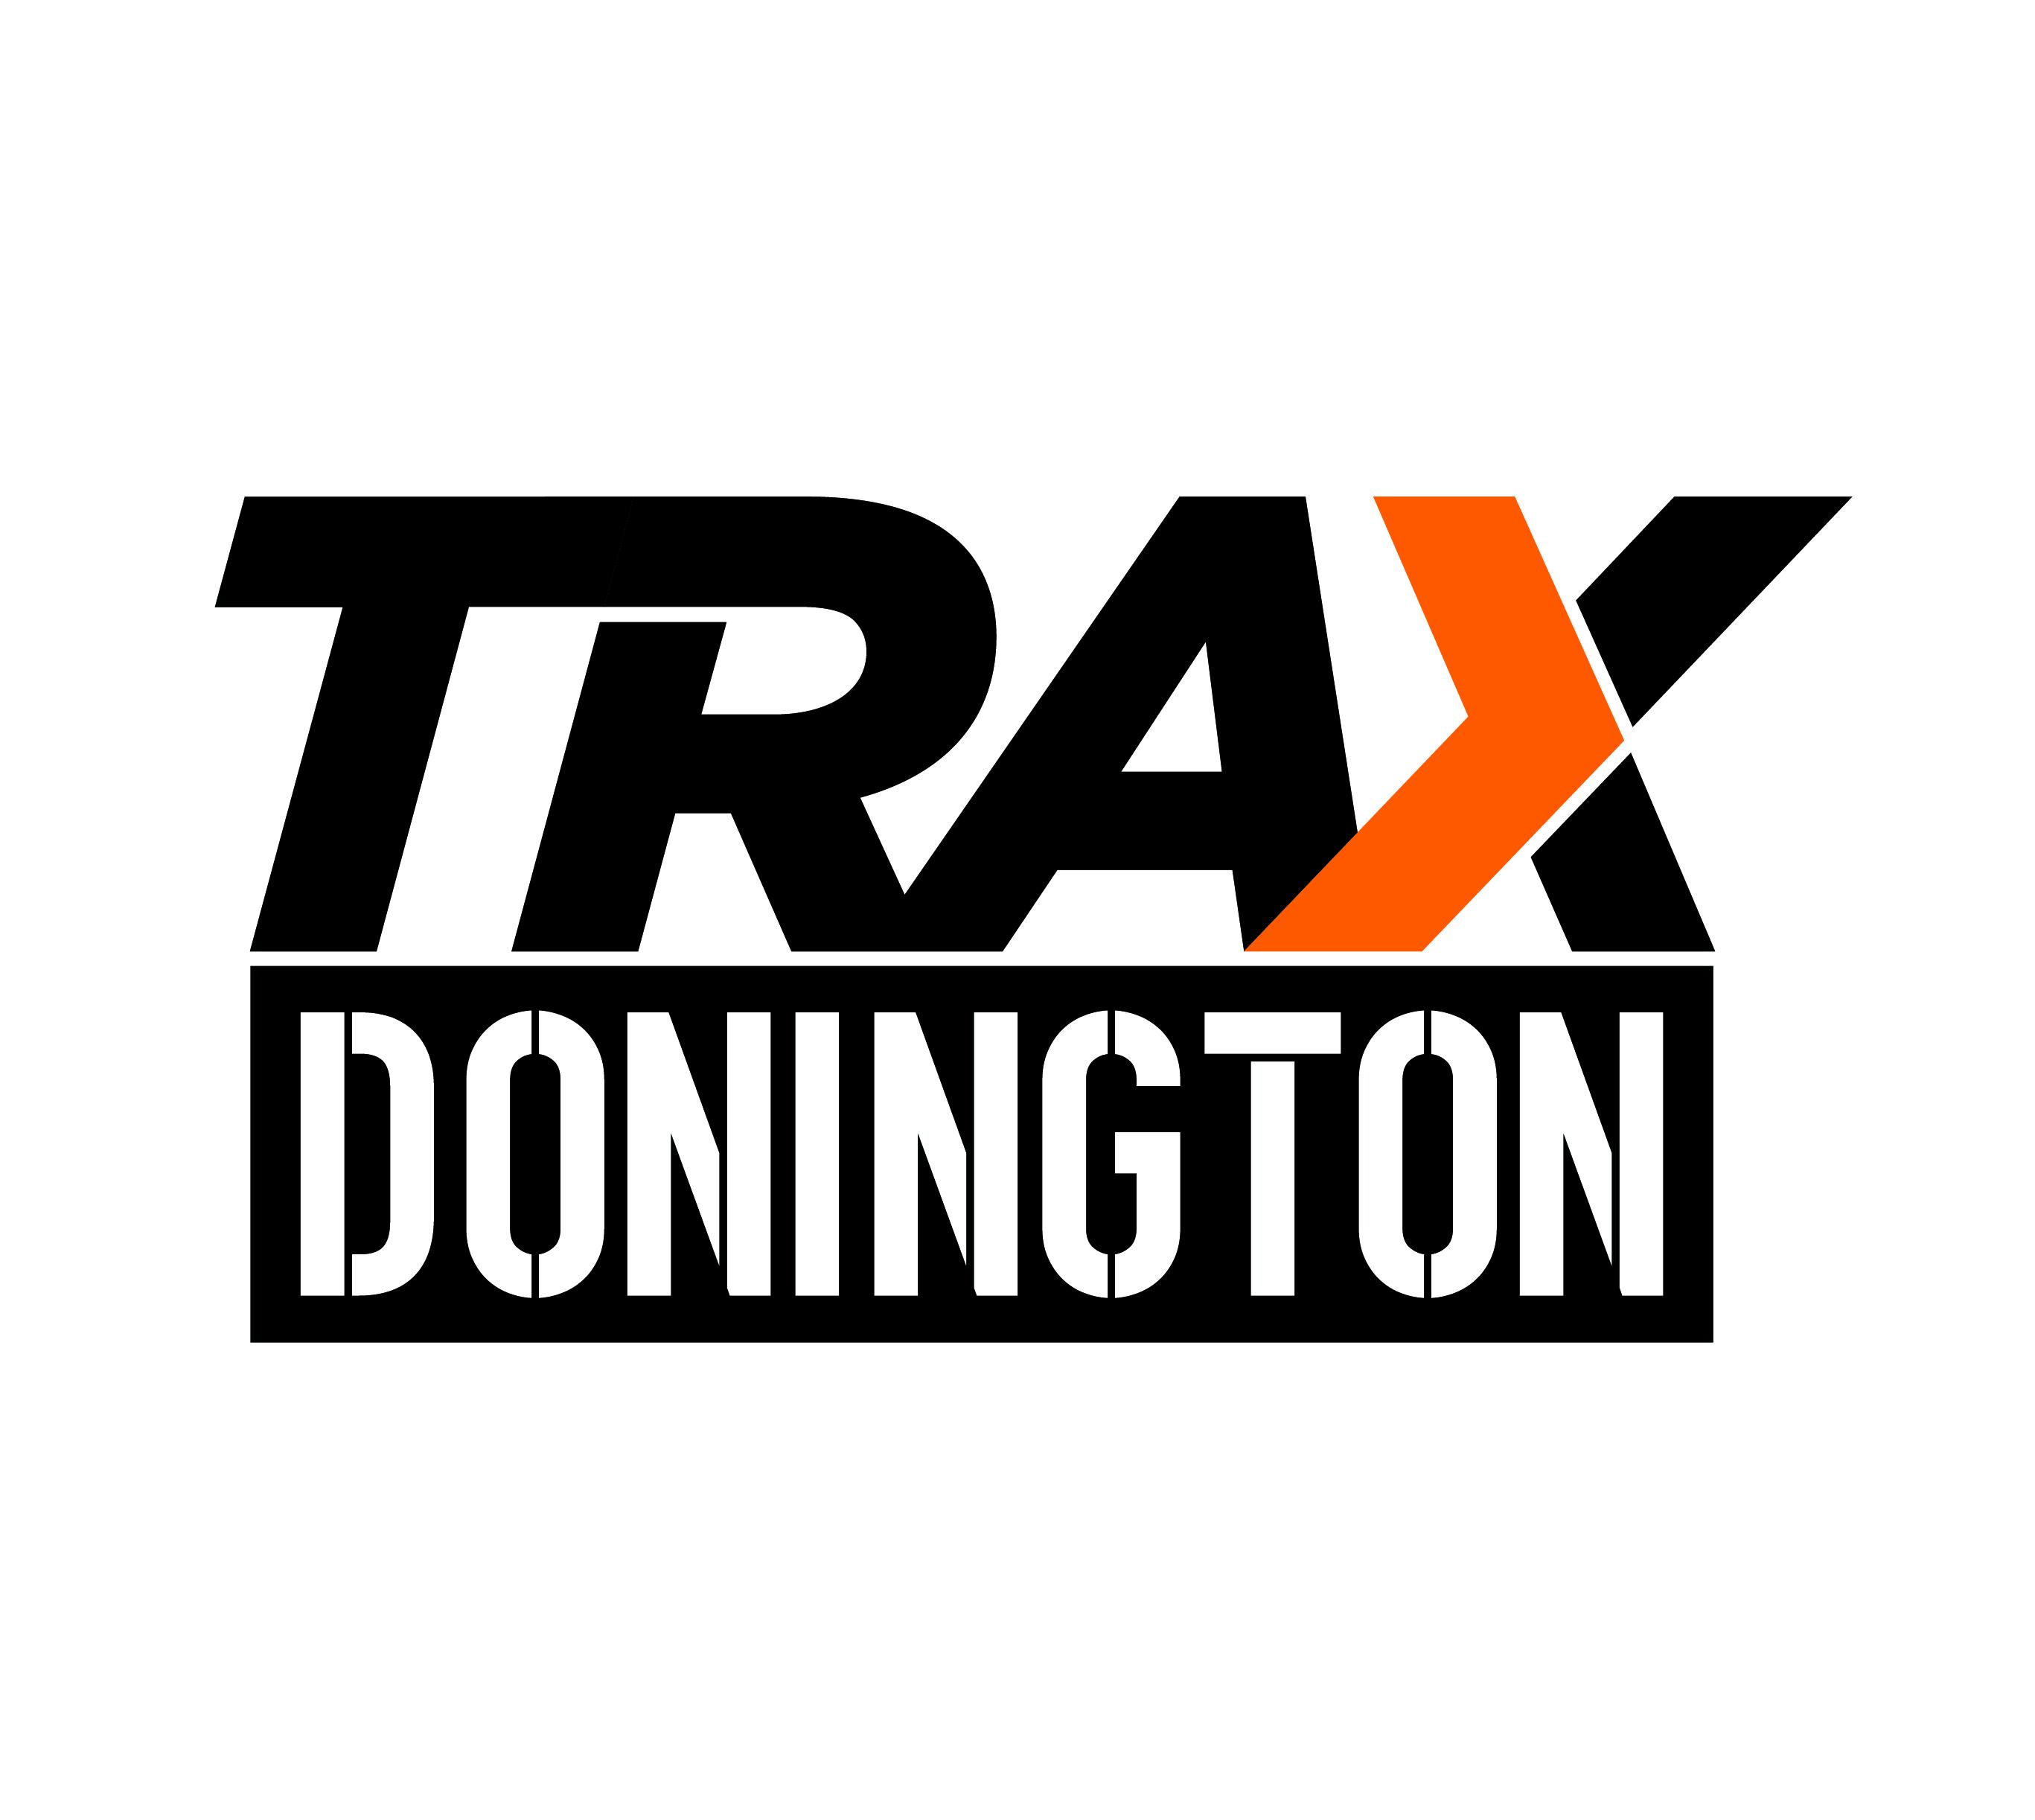 Meet the Reis team at Trax Donington 2019!